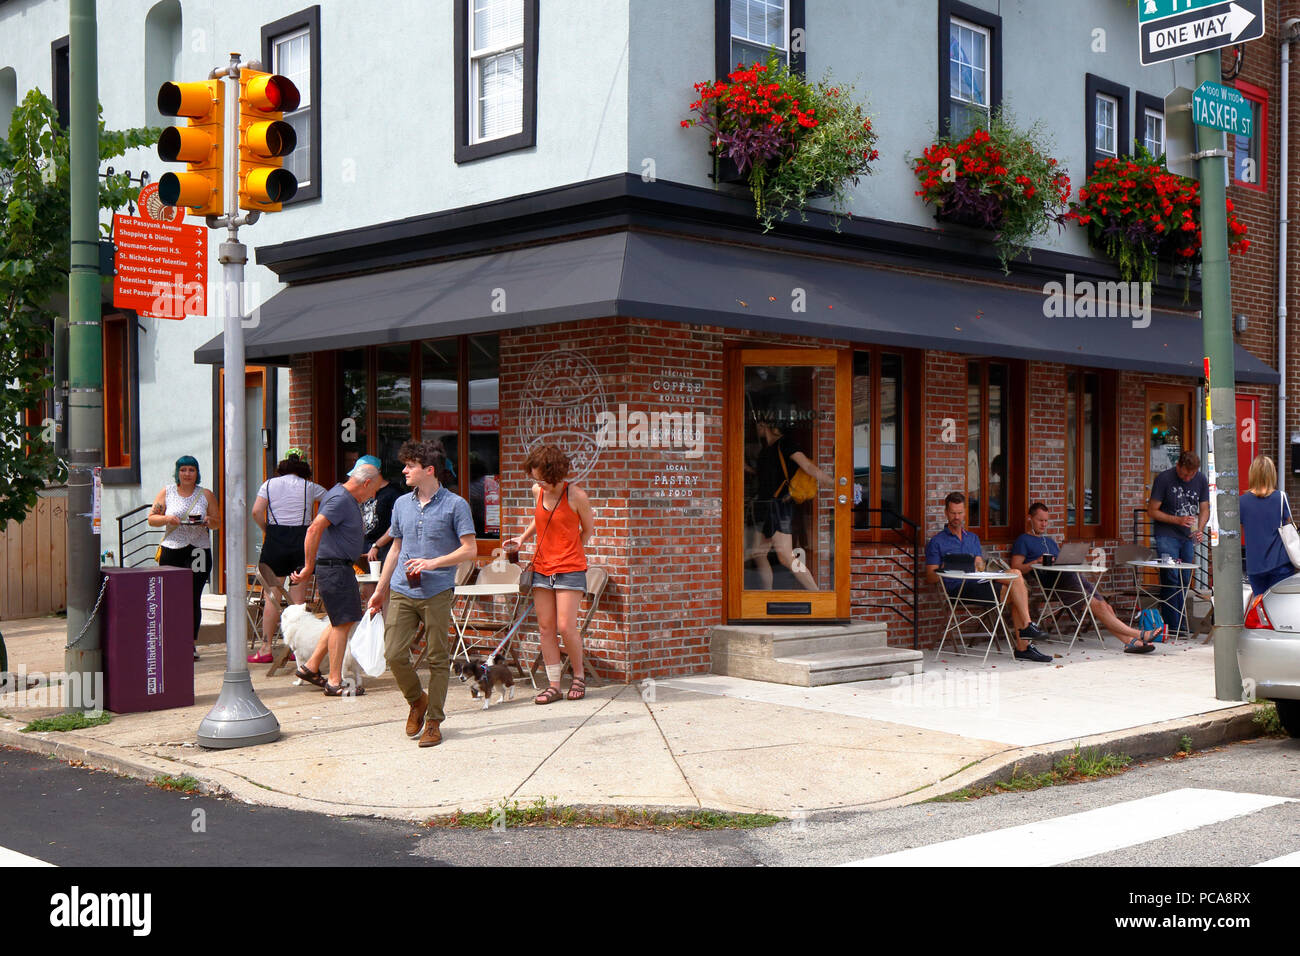 Rival Bros Coffee Bar, 1100 Tasker St, Philadelphia, PA - Stock Image